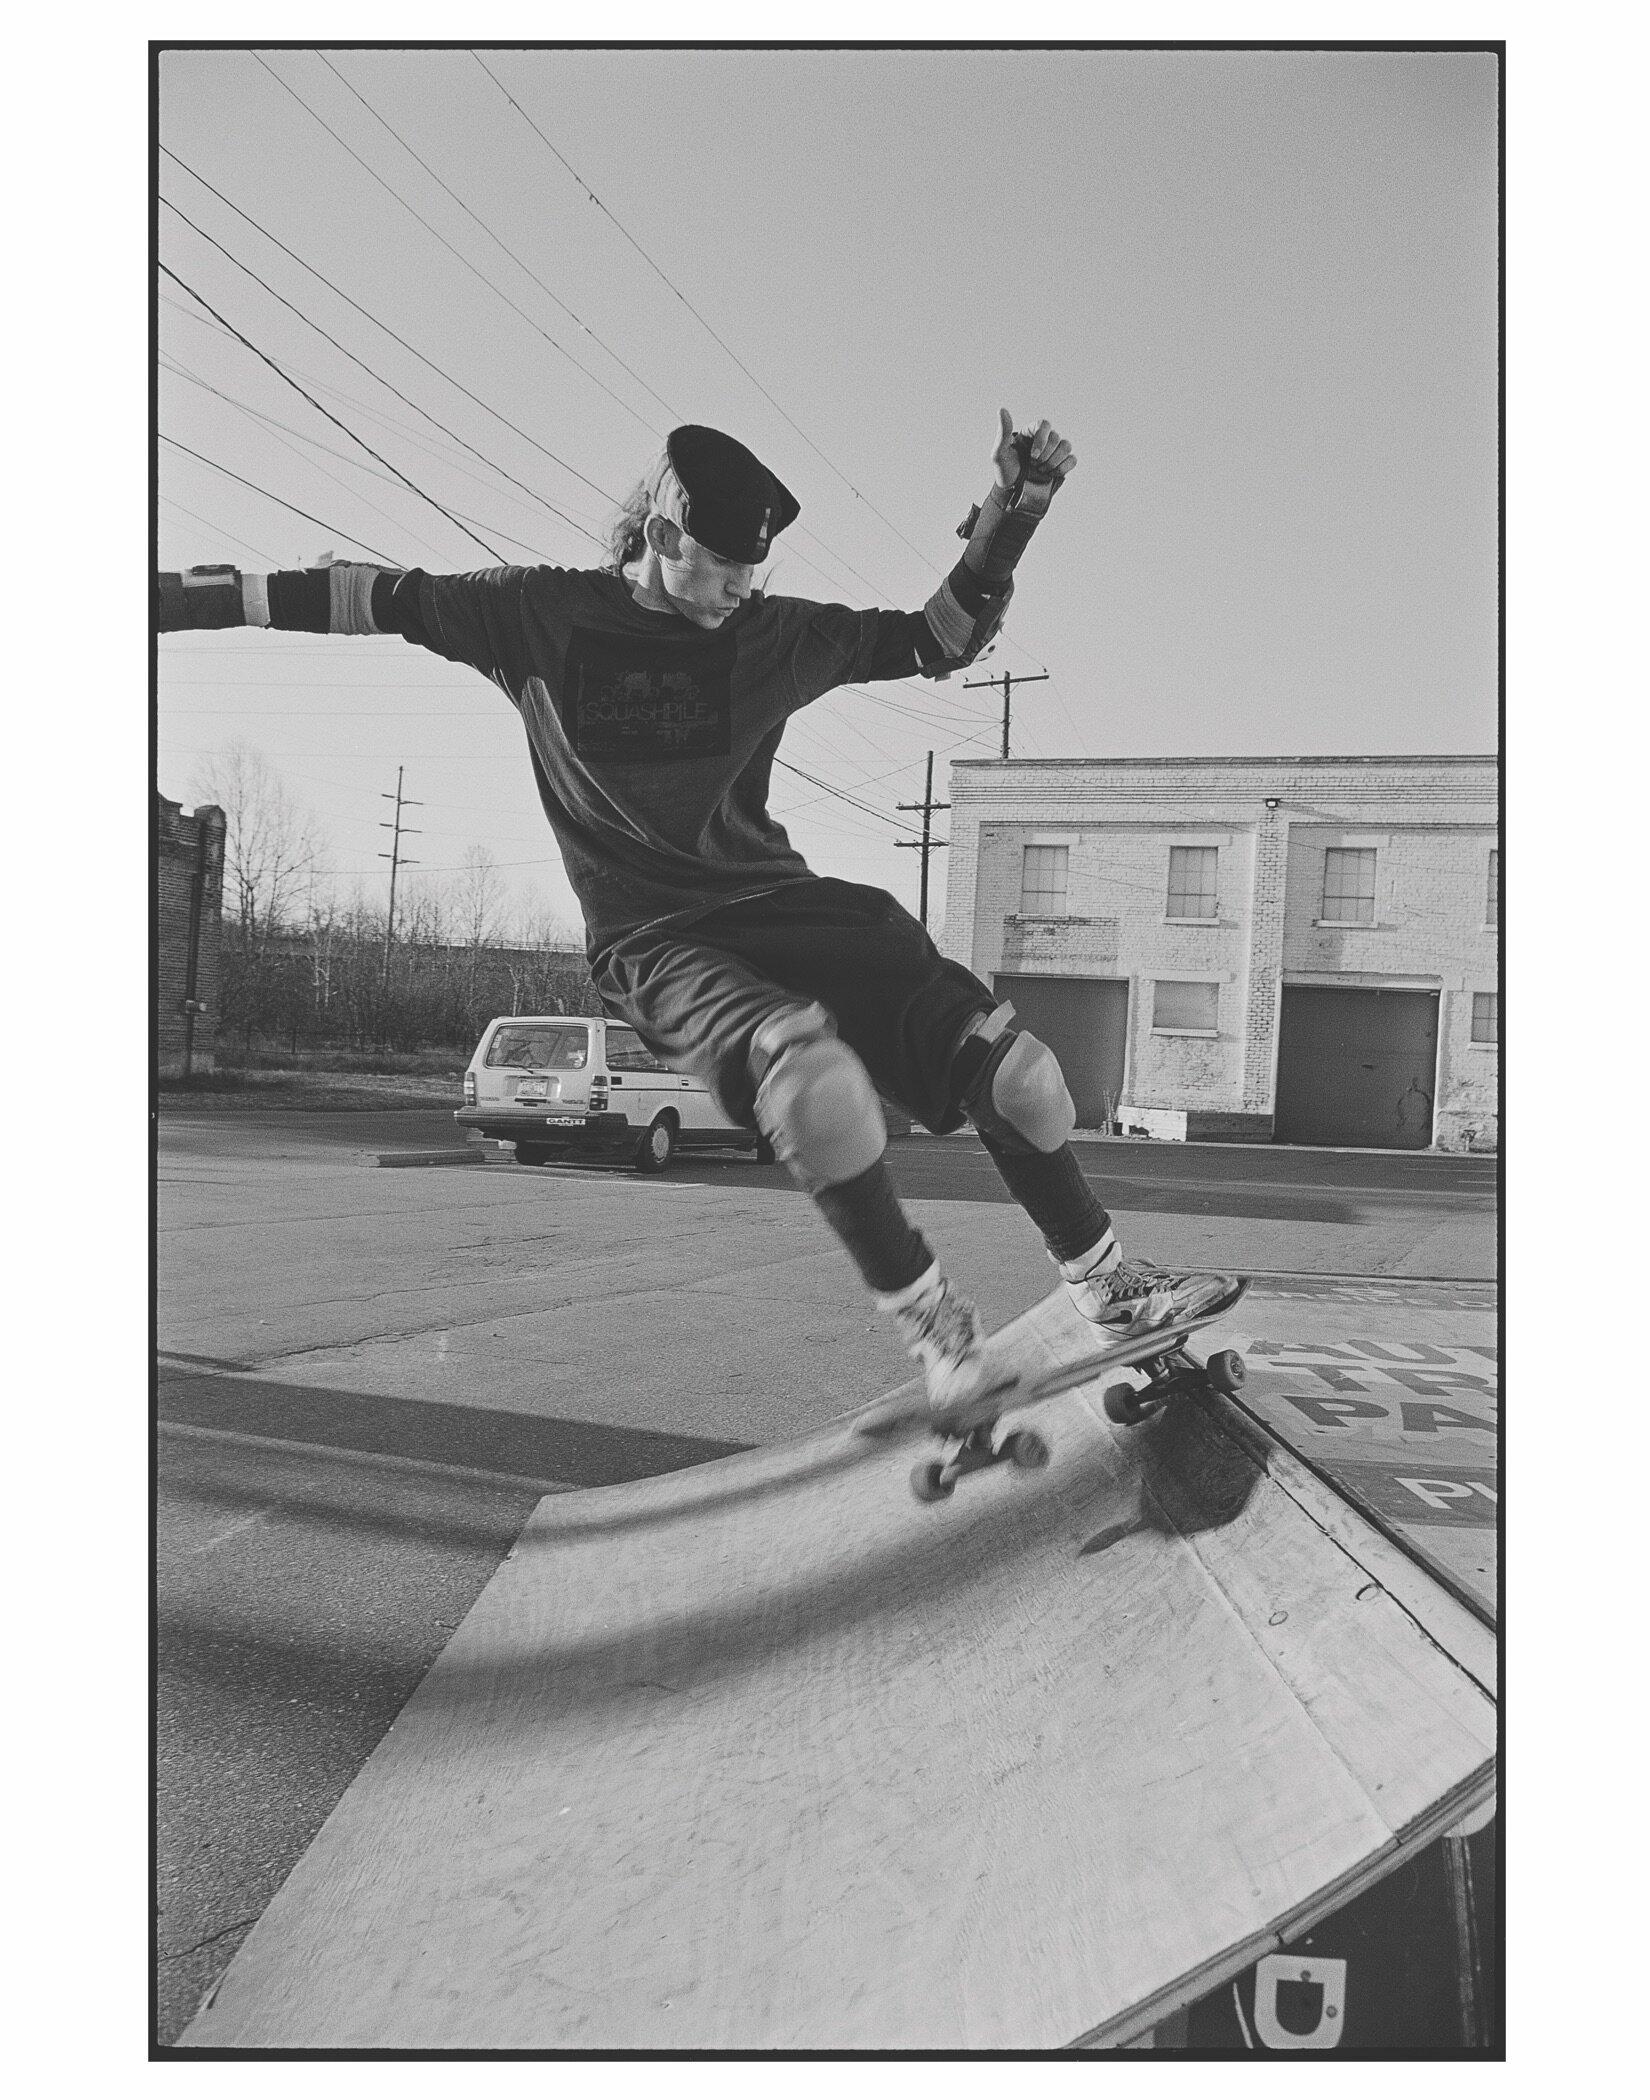 Chris skating at CURVE 1990.jpg